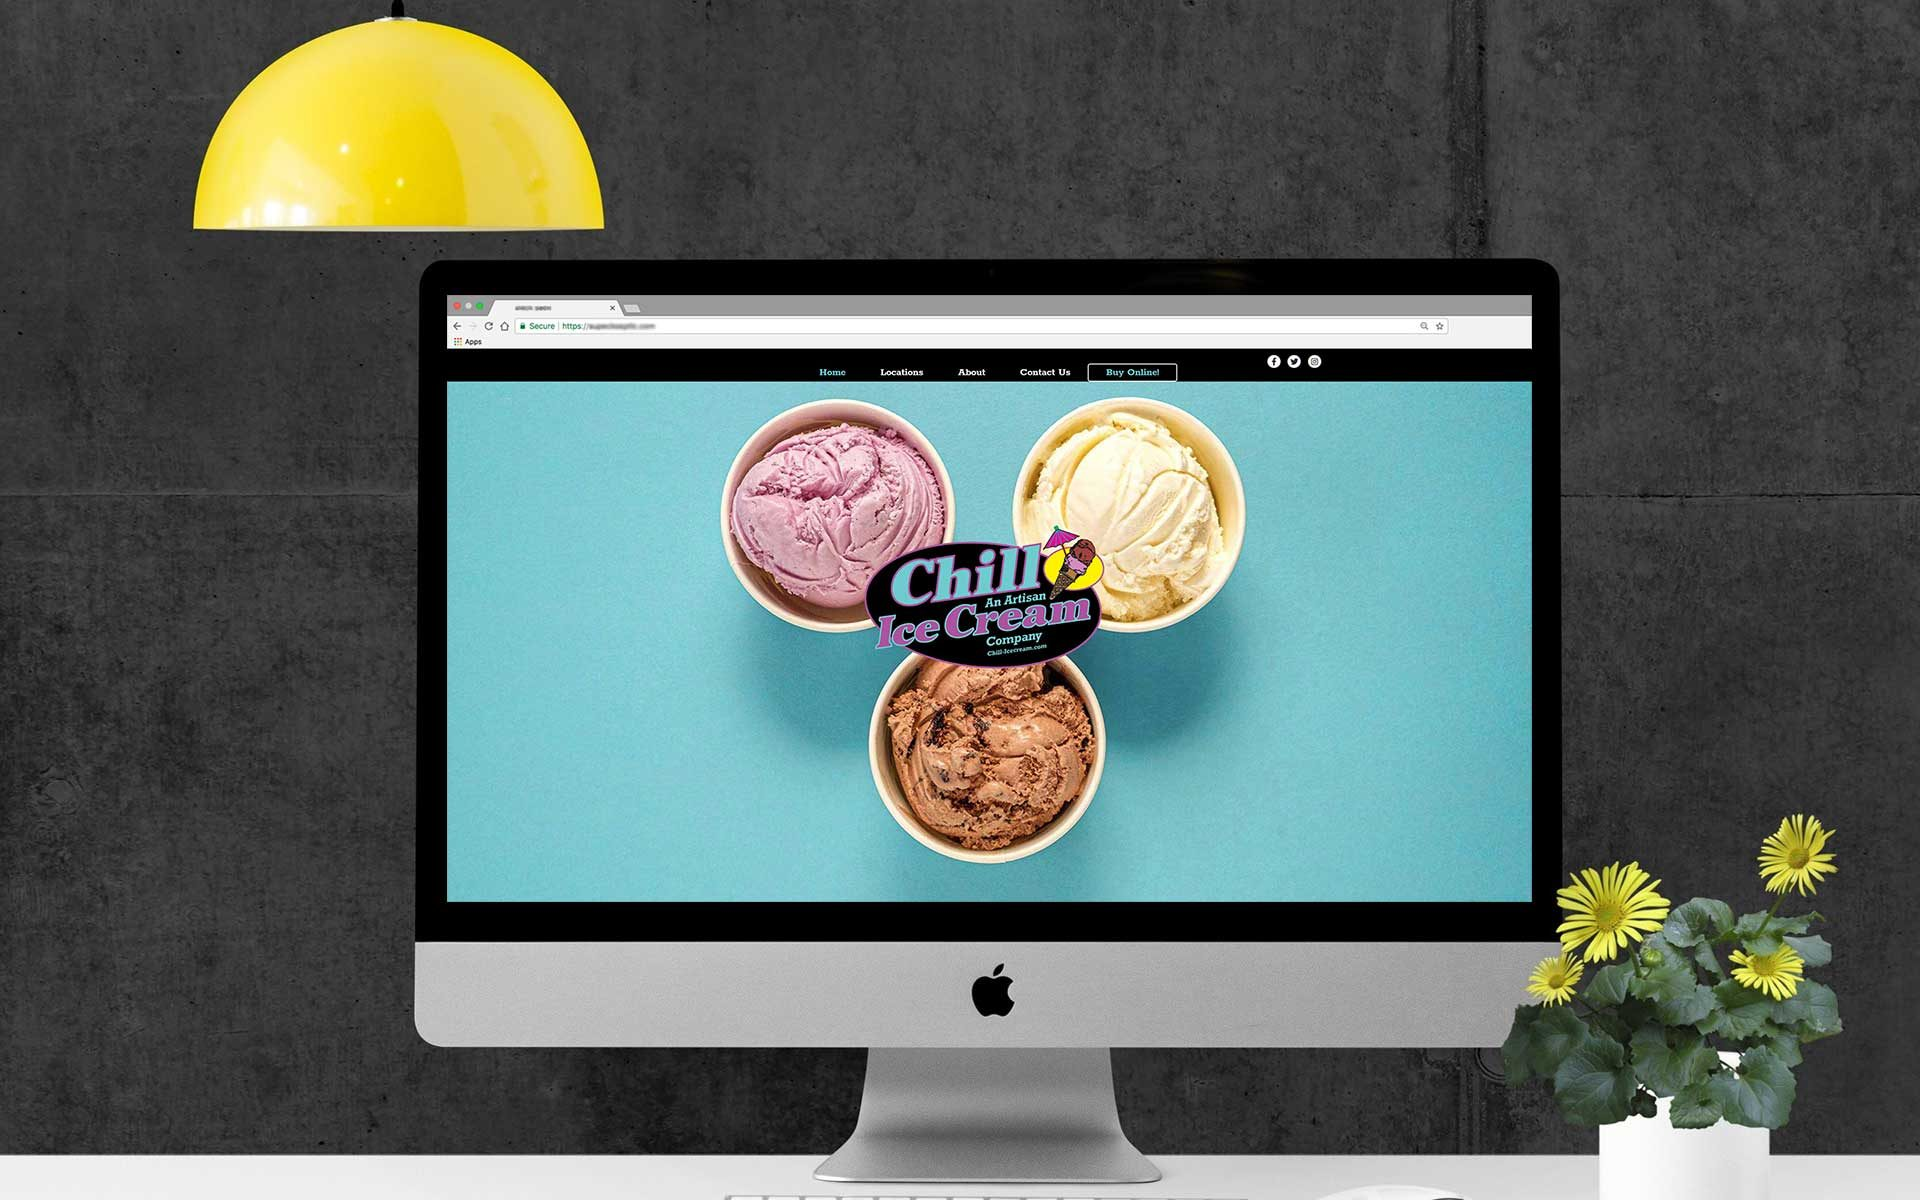 chill-icecream.com website redesign